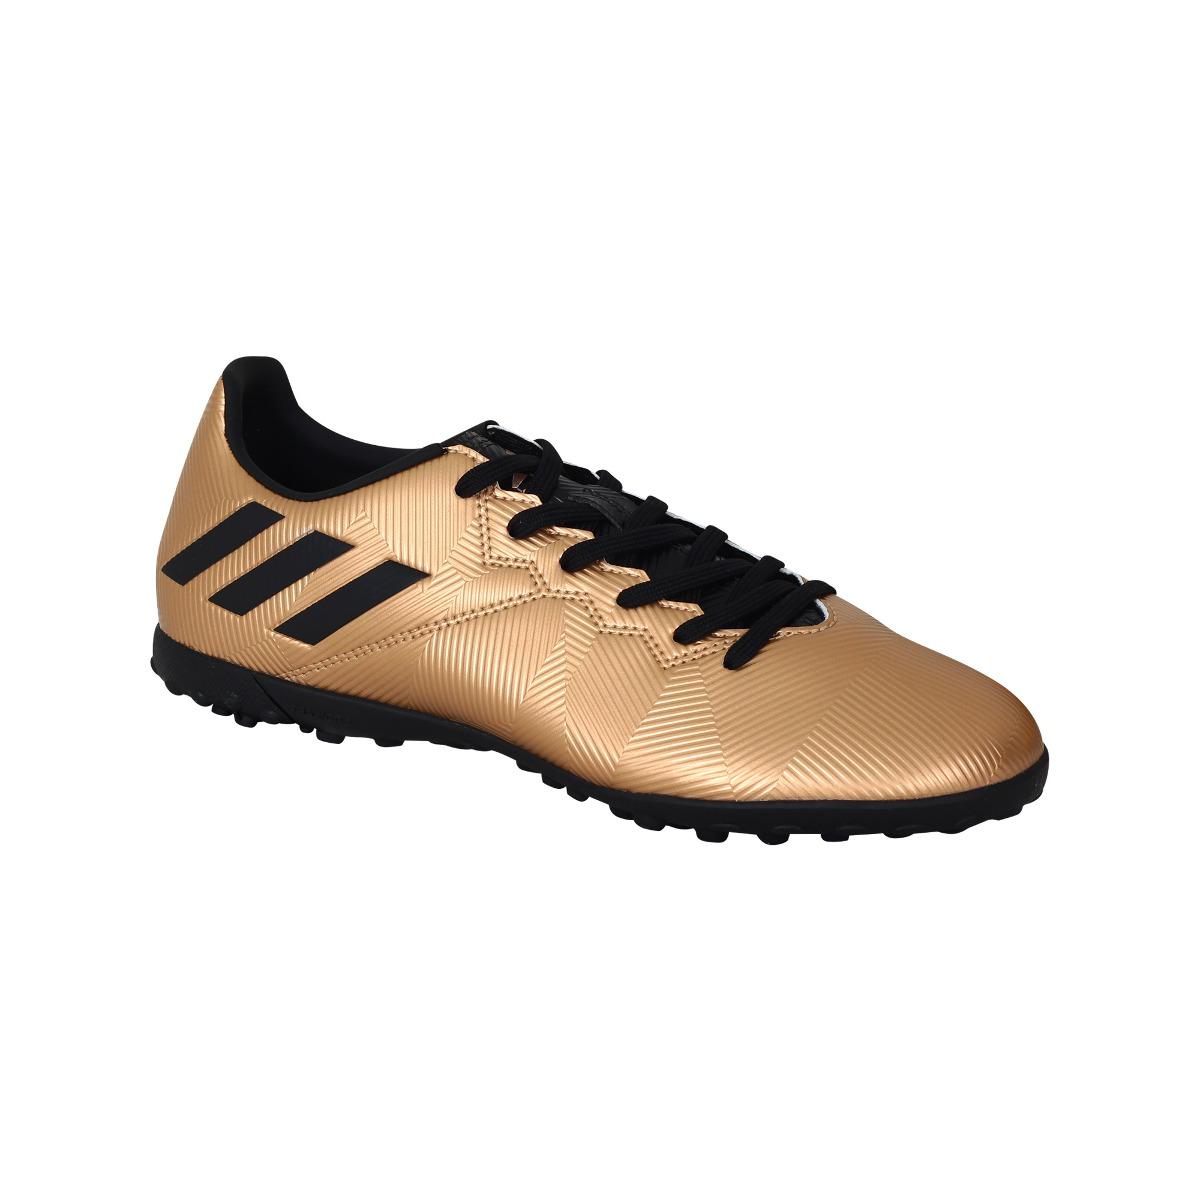 3cd1be042bc zapato adidas futbol messi 16.4 tf. Cargando zoom.